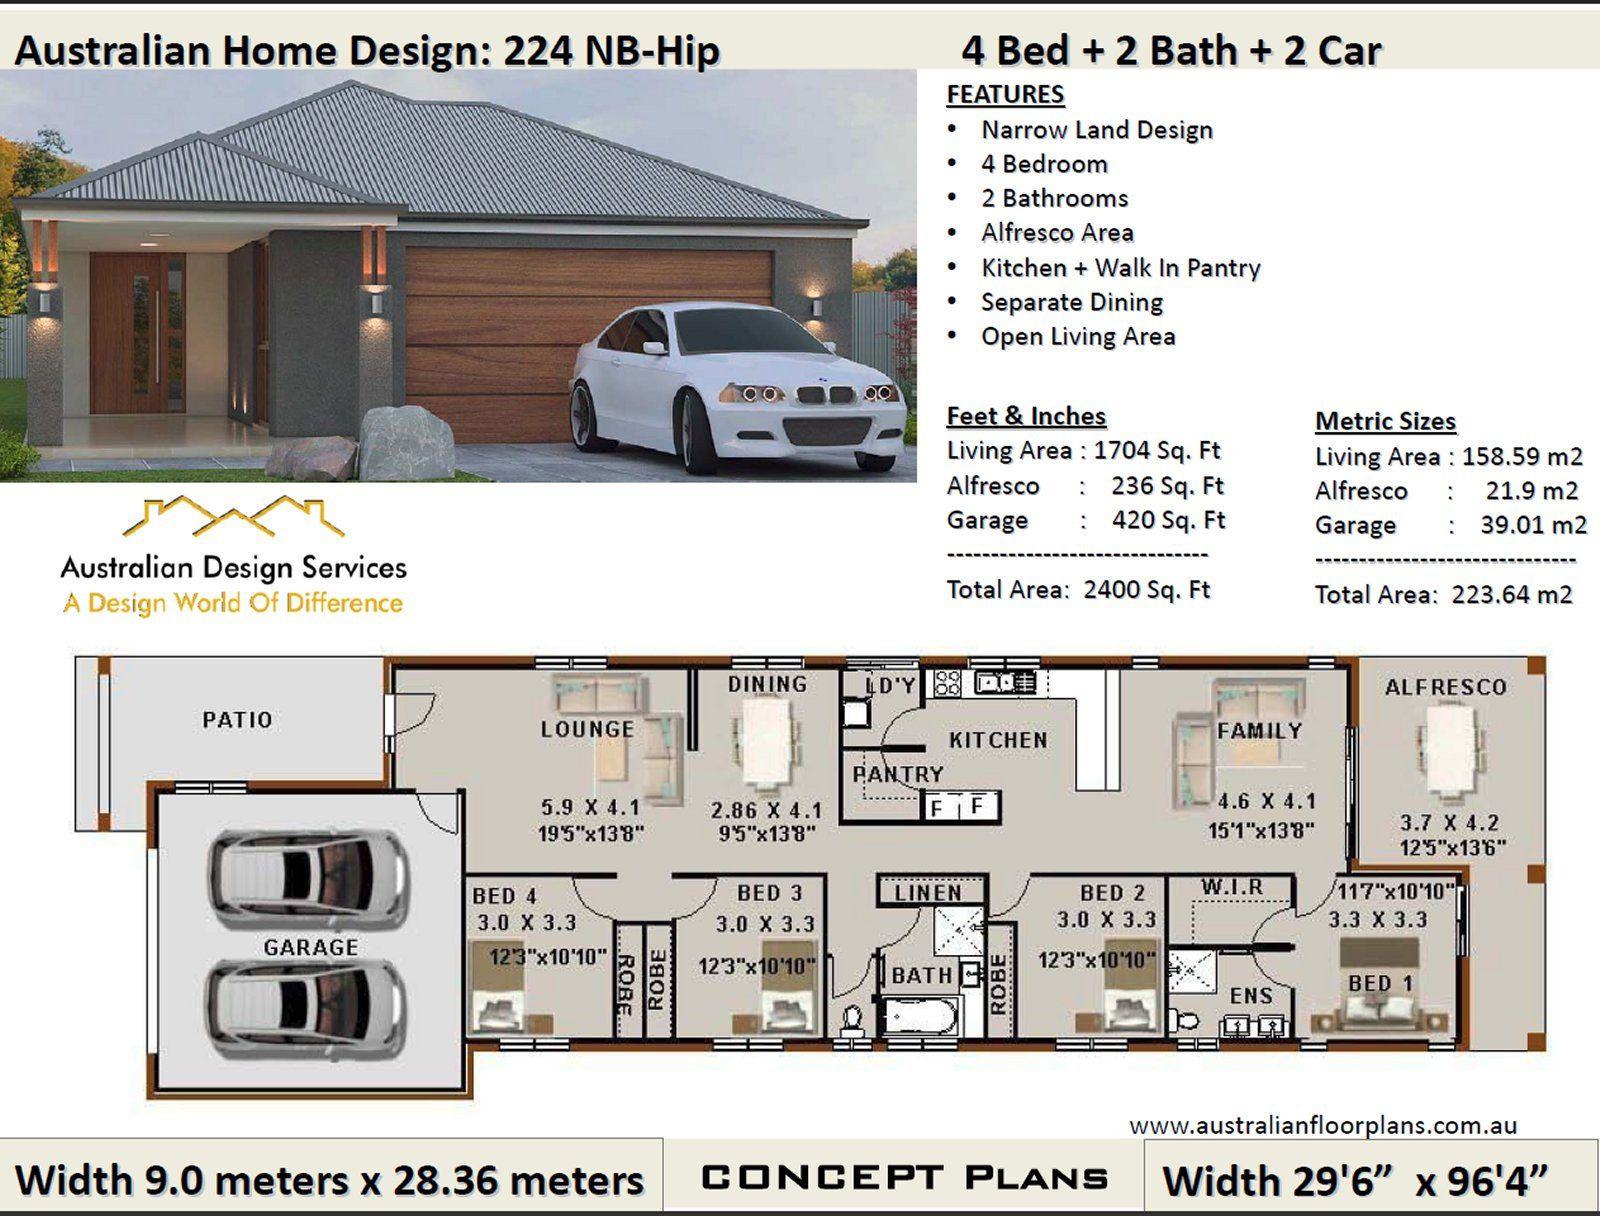 223 M2 Or 2400 Sq Foot Australian 4 Bedroom House Plan Etsy In 2021 Narrow Lot House Plans Narrow House Plans House Plans Australia